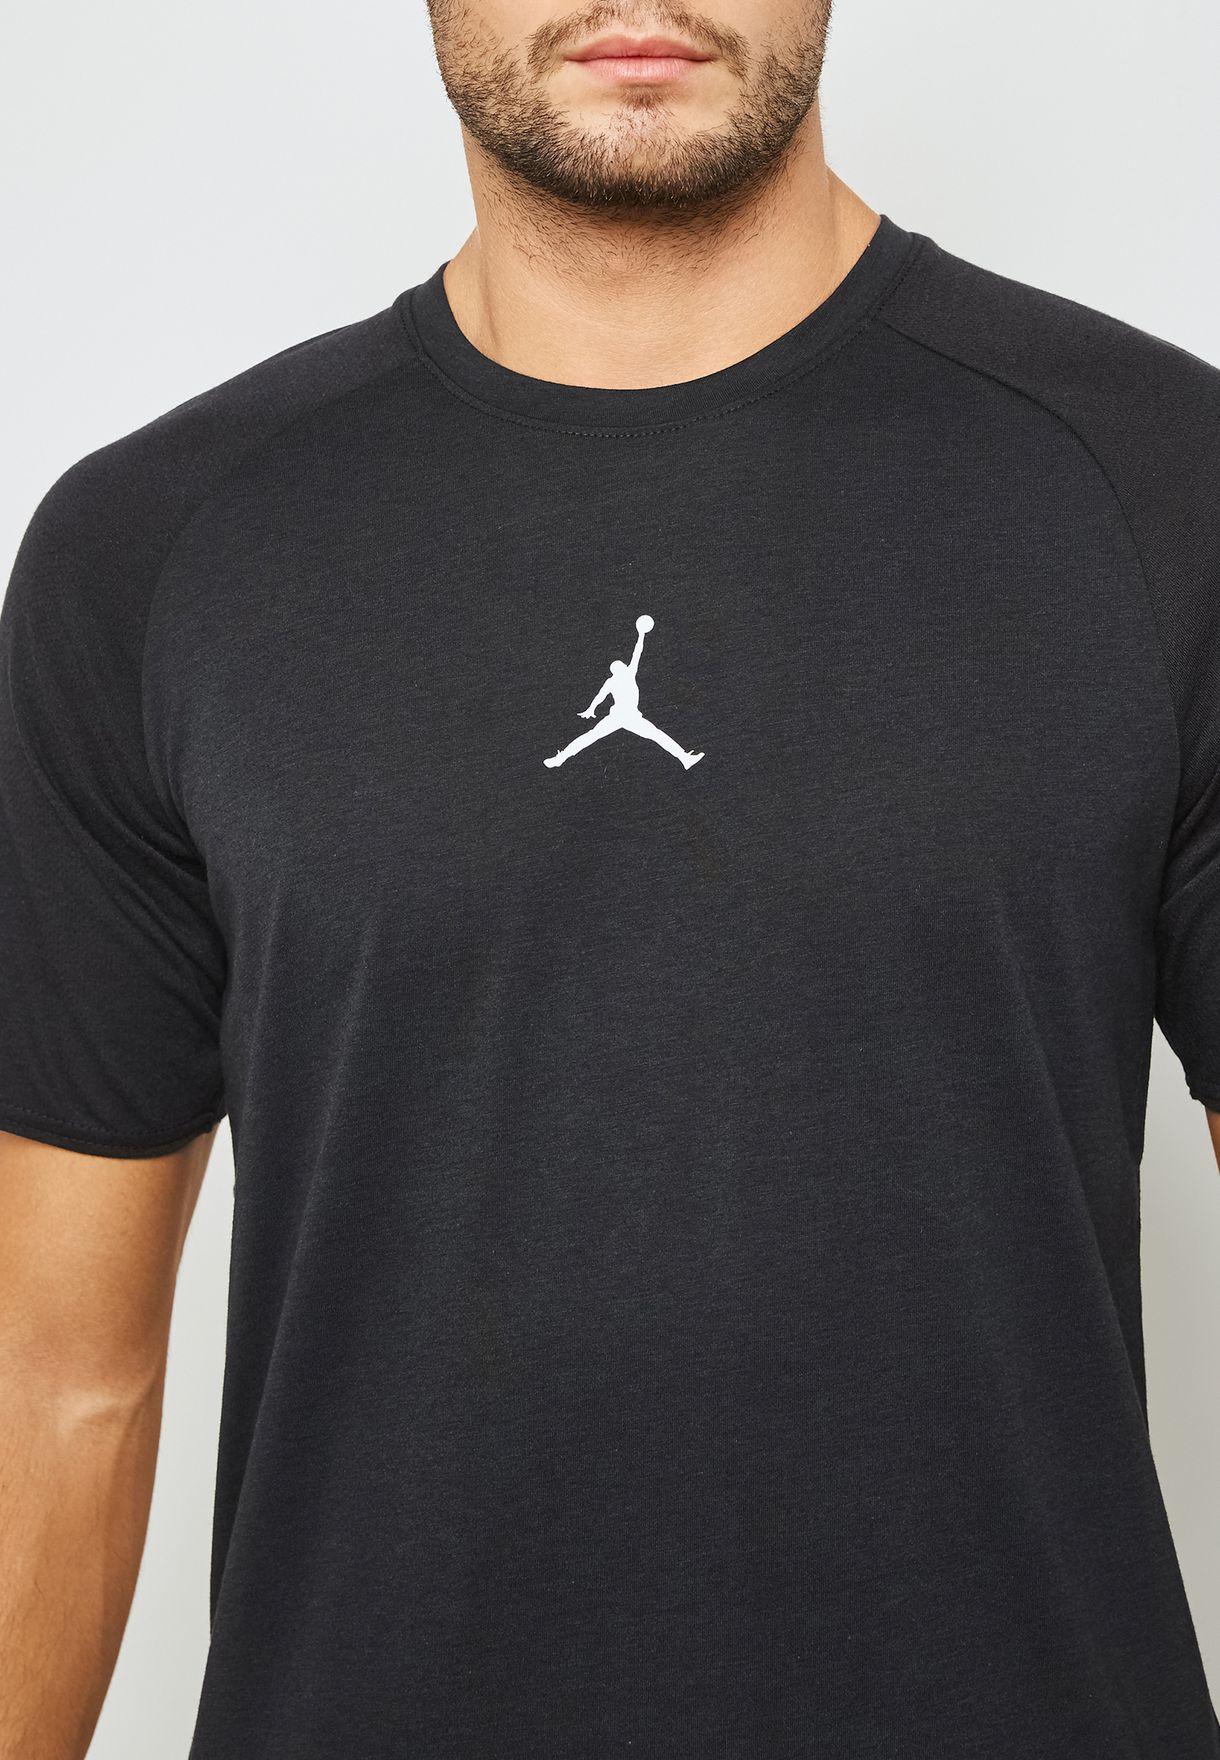 7a4752539882 Shop Nike black Jordan 23 Alpha T-Shirt 889713-013 for Men in Saudi ...